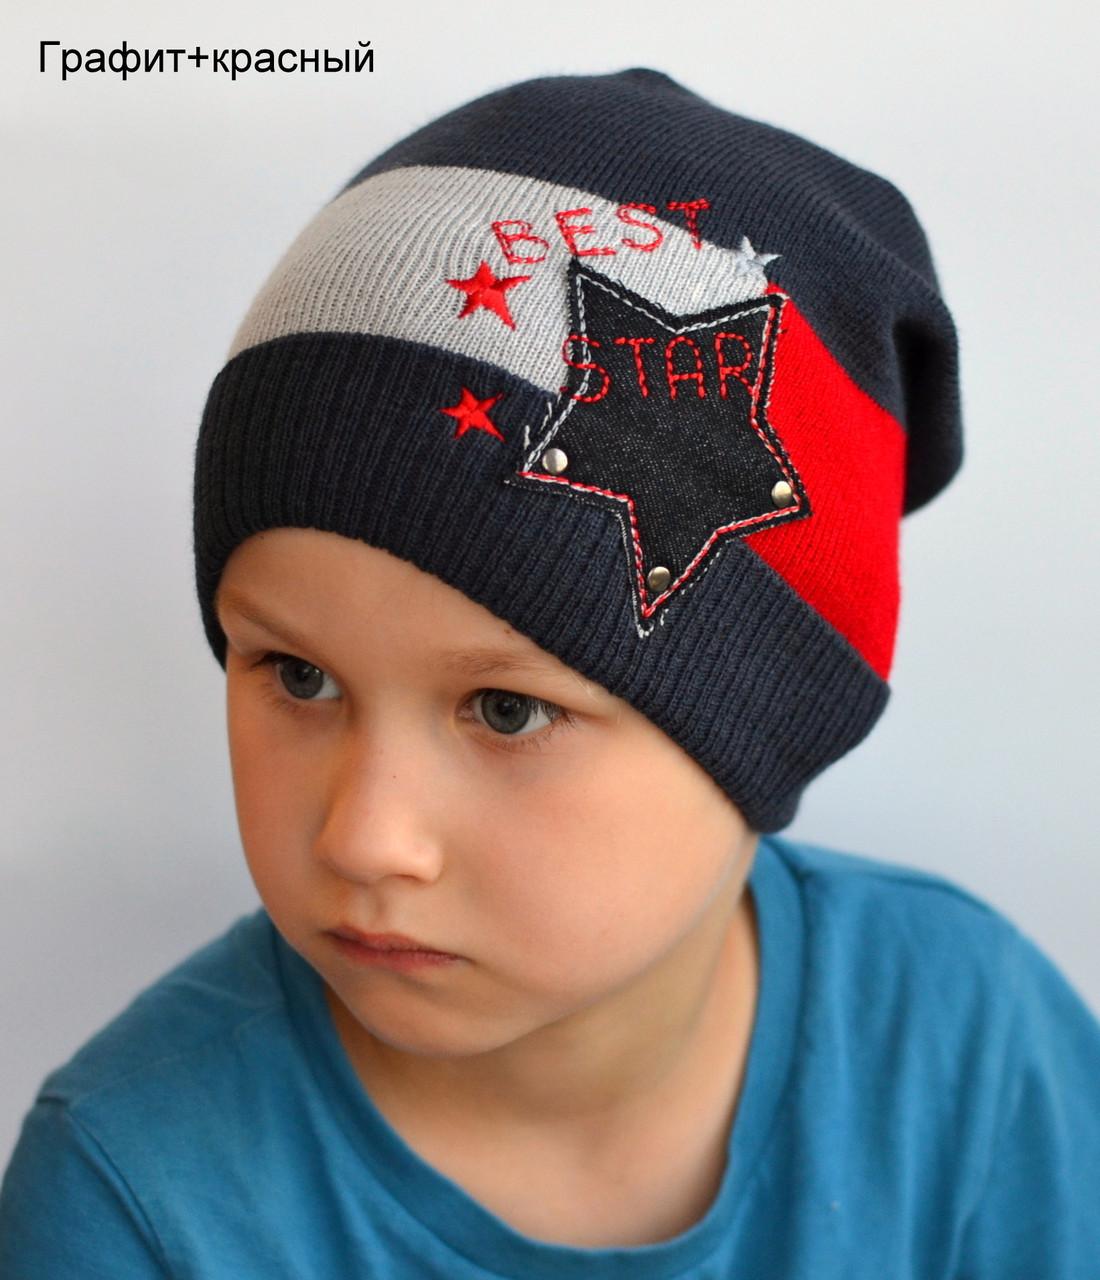 Шапка детская Звезда р. 52 (2-4 года)